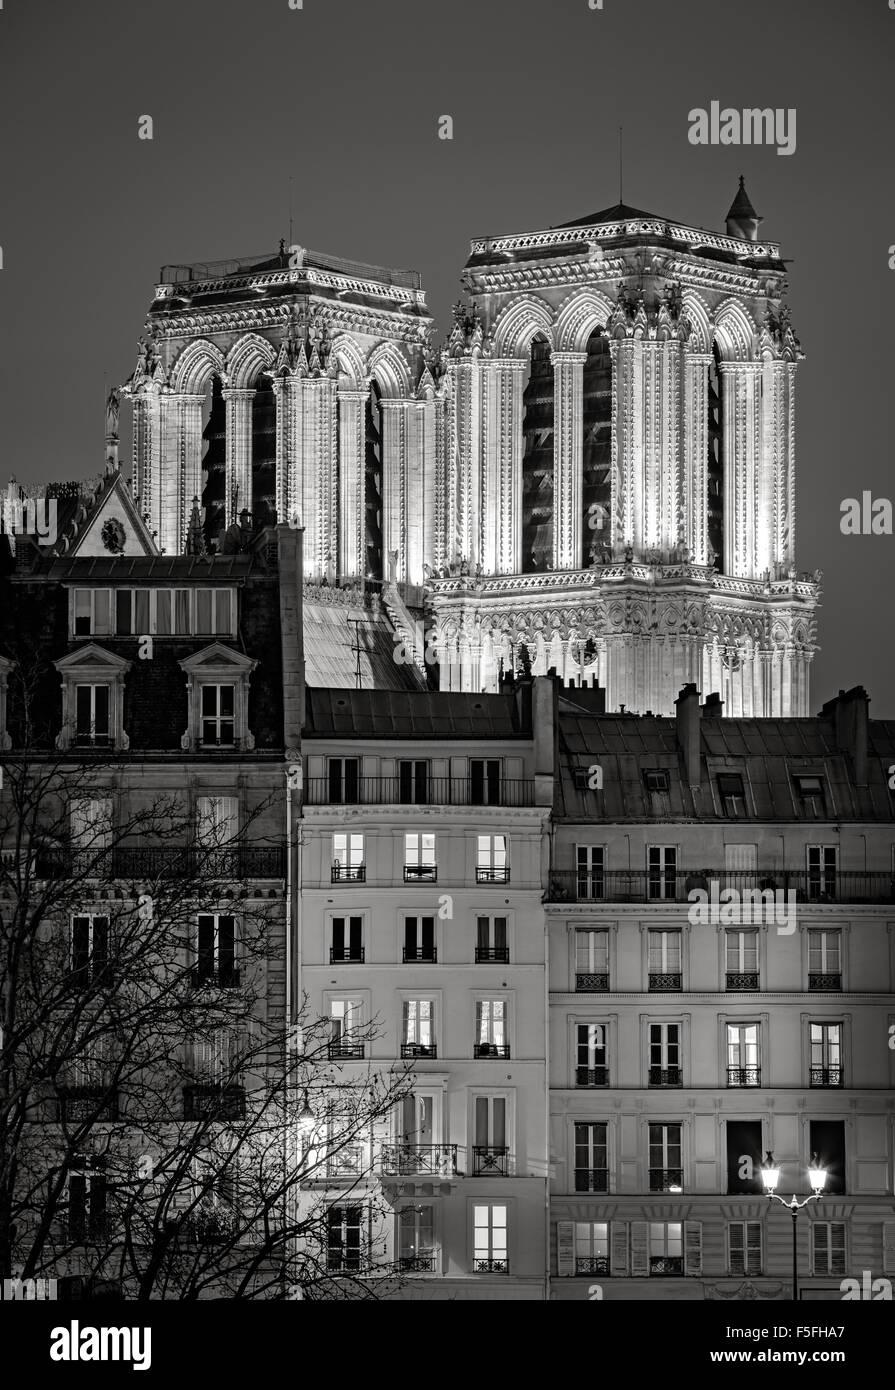 Französische gotische Türme der Kathedrale Notre Dame de Paris bei Nacht beleuchtet. Ile De La Cite, 4. Stockbild